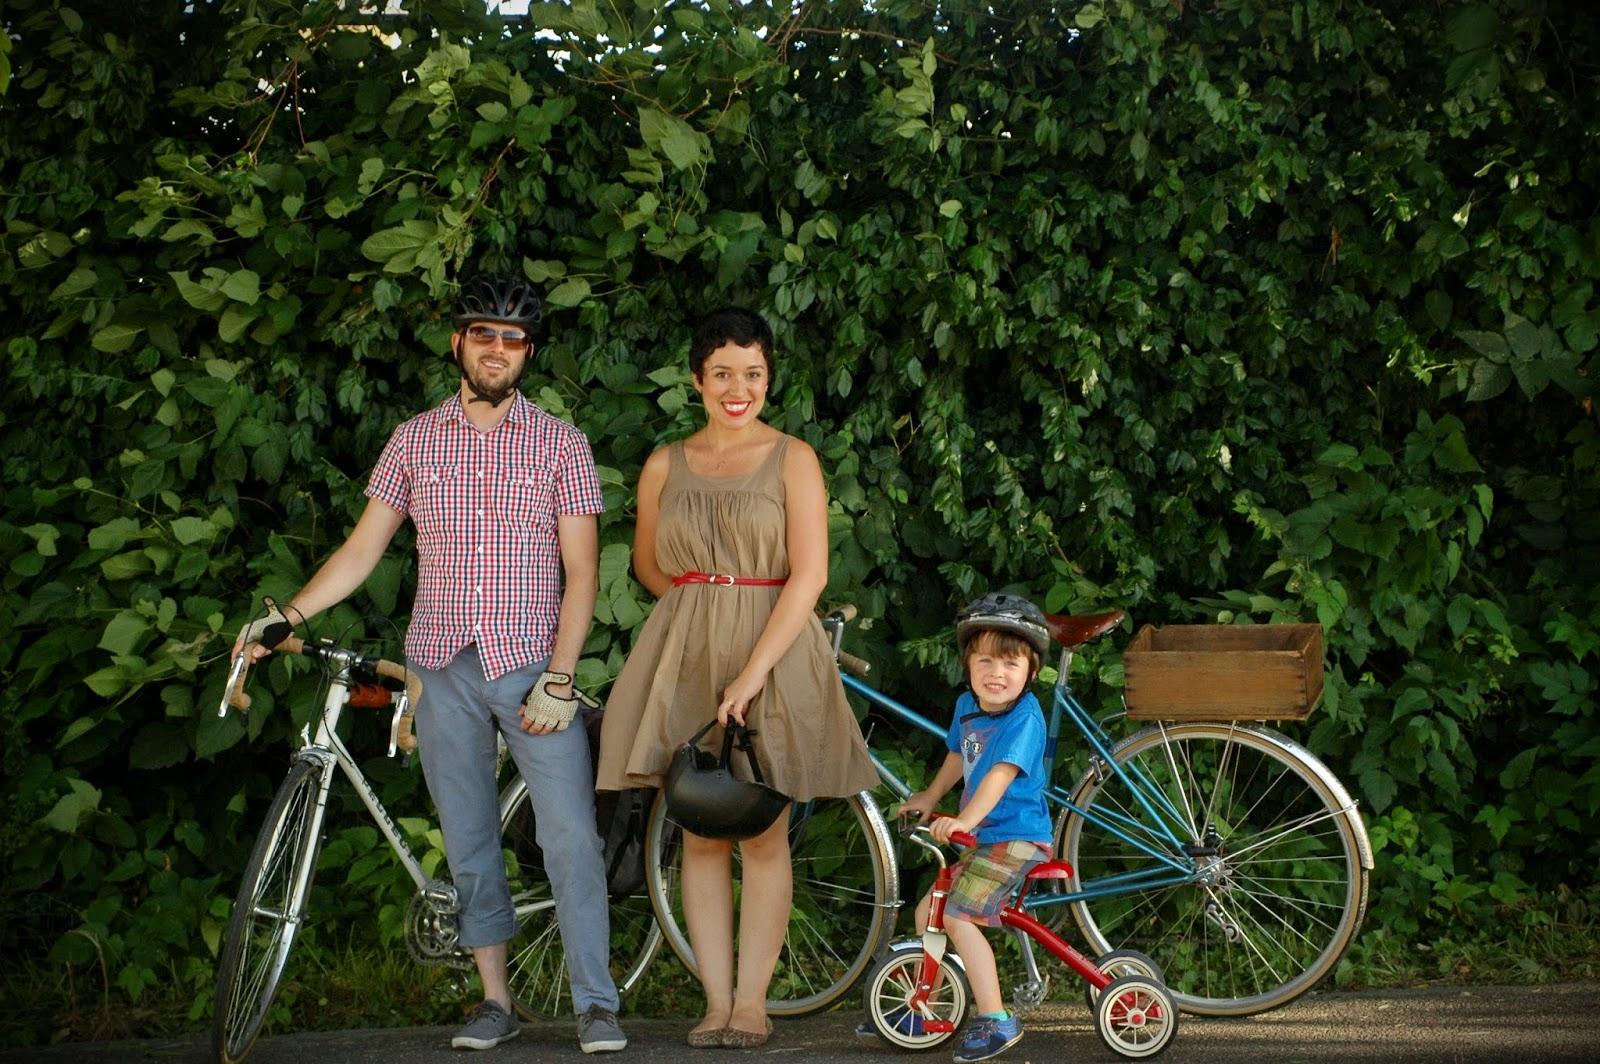 Bikes Springfield Mo Columbia Mo Springfield